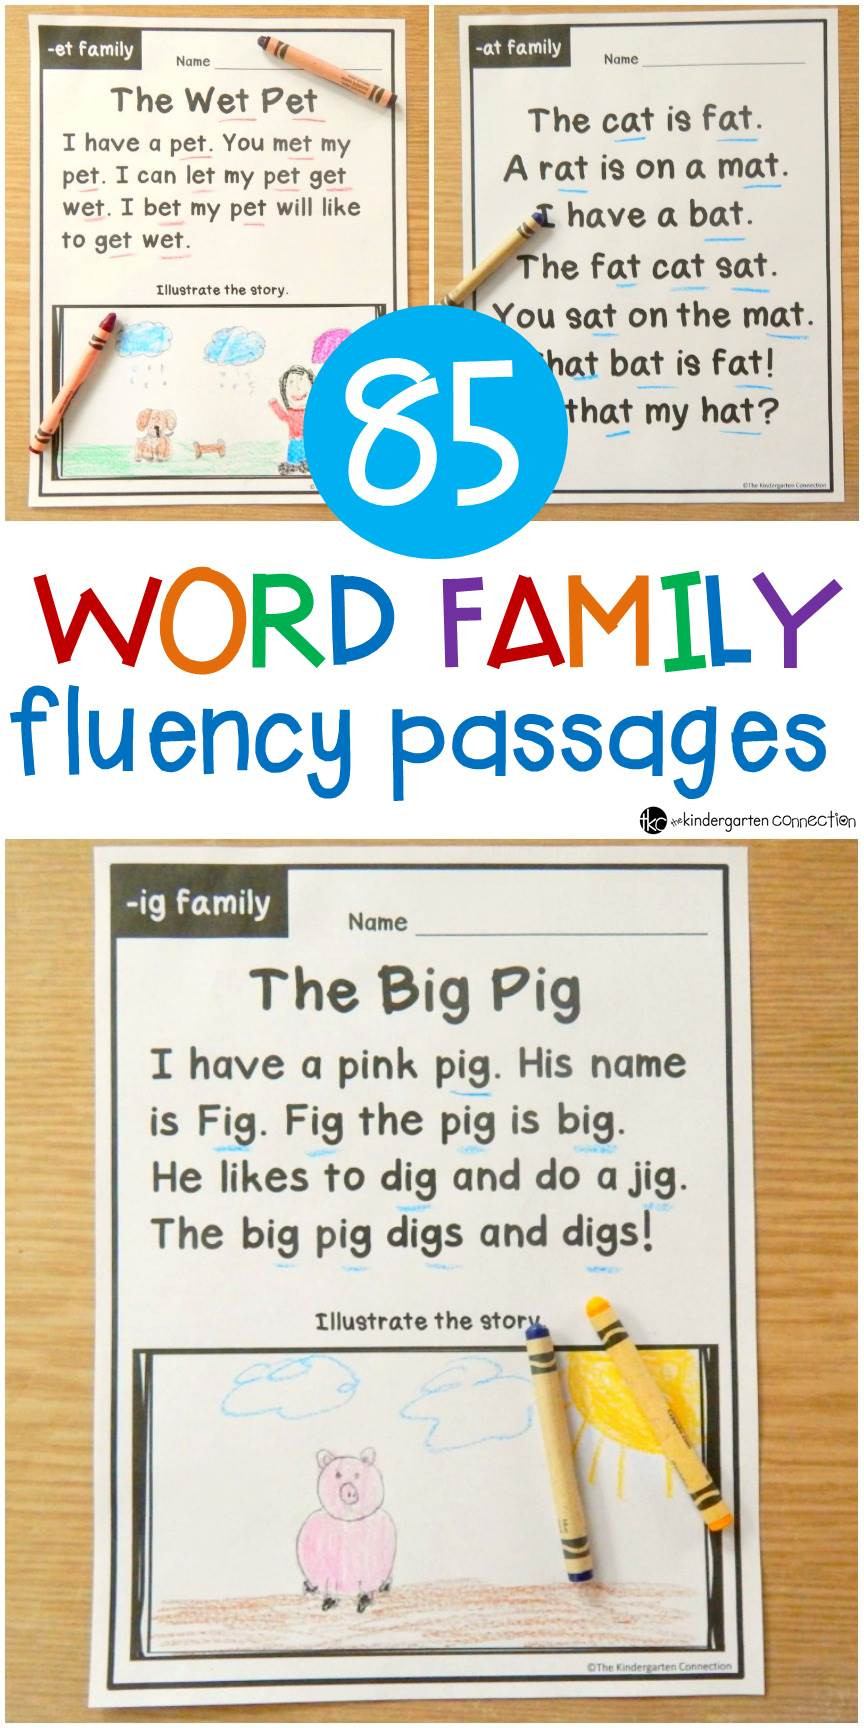 Free Printable Kindergarten Fluency Passages Word Family Fluency Passages for Early Readers In Kindergarten